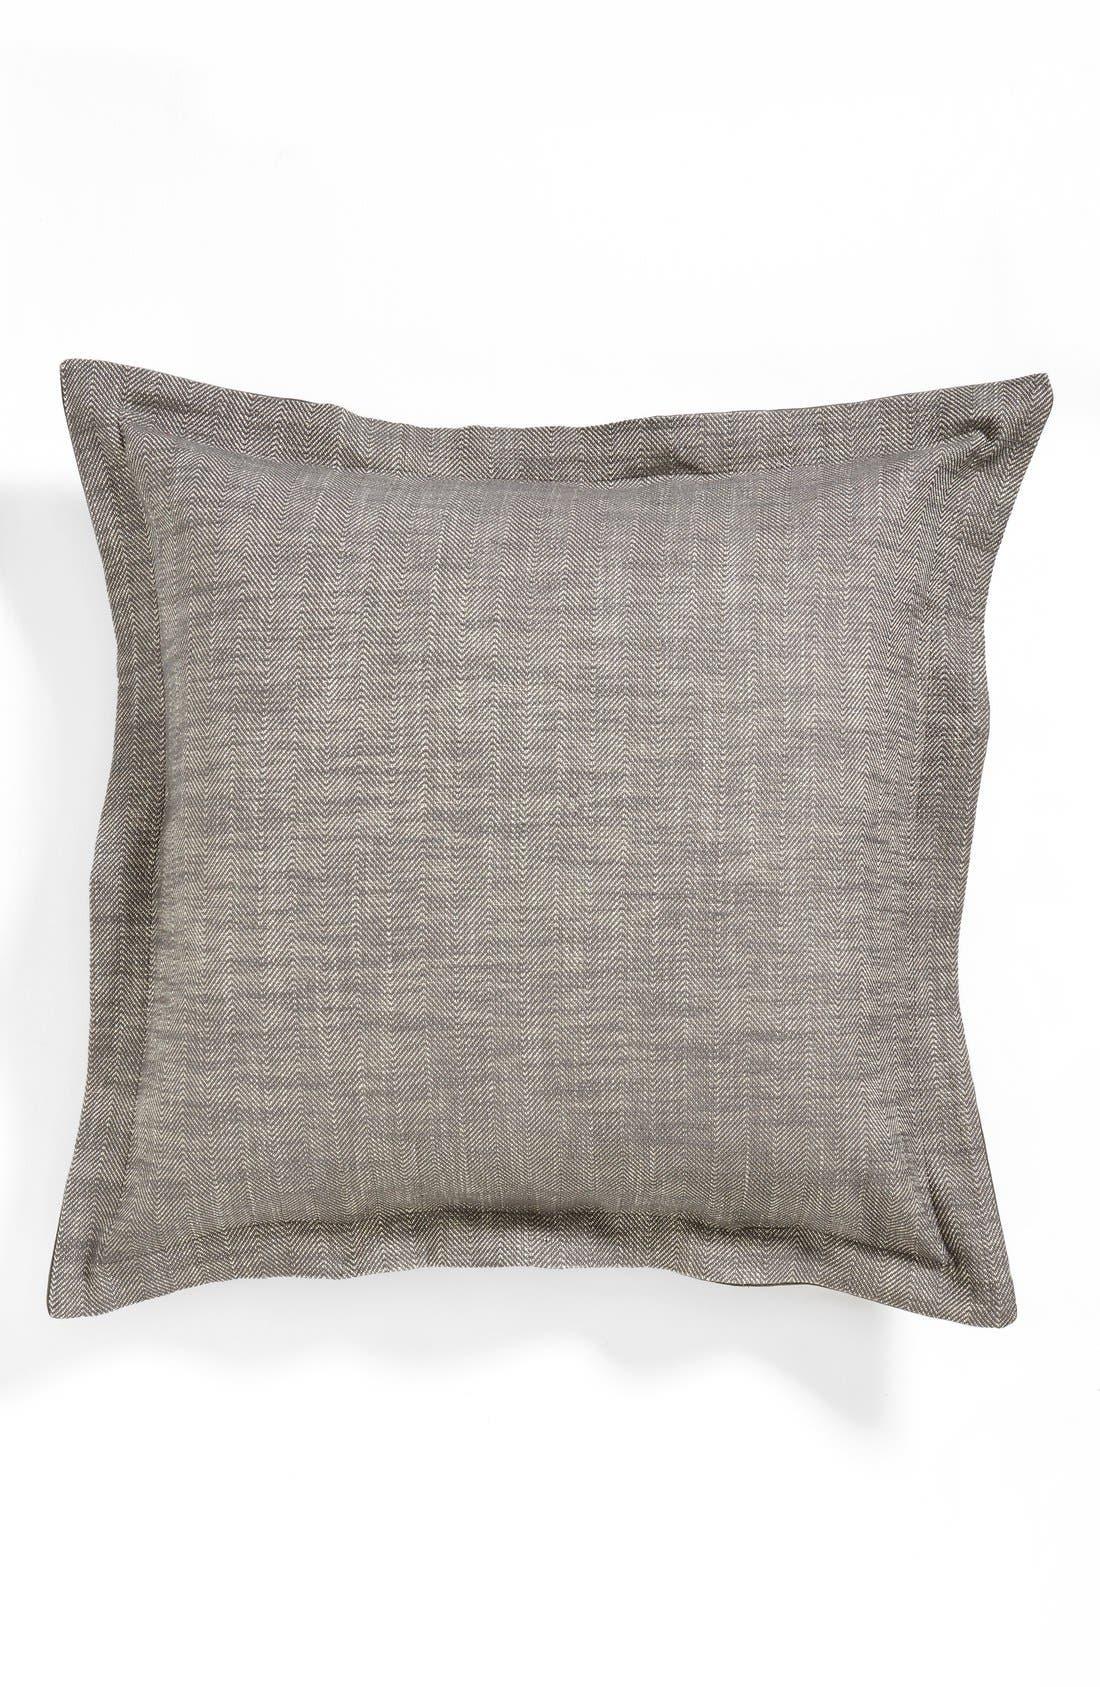 Alternate Image 1 Selected - Amity Home 'Logan' Euro Pillow Sham